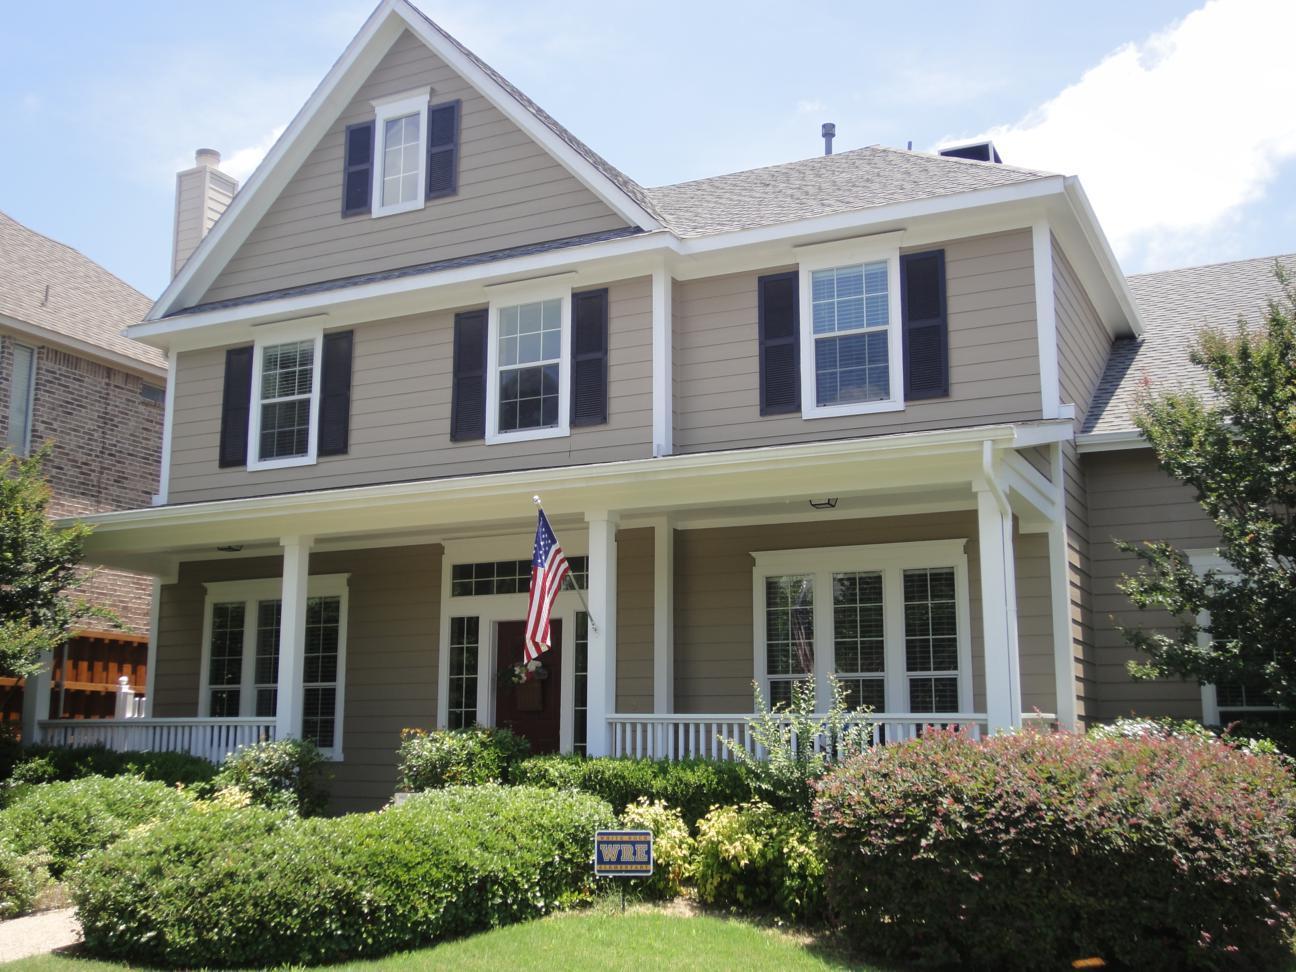 Wonderful Home Decor Store Names 10 Exterior House Colors 1296 X 972